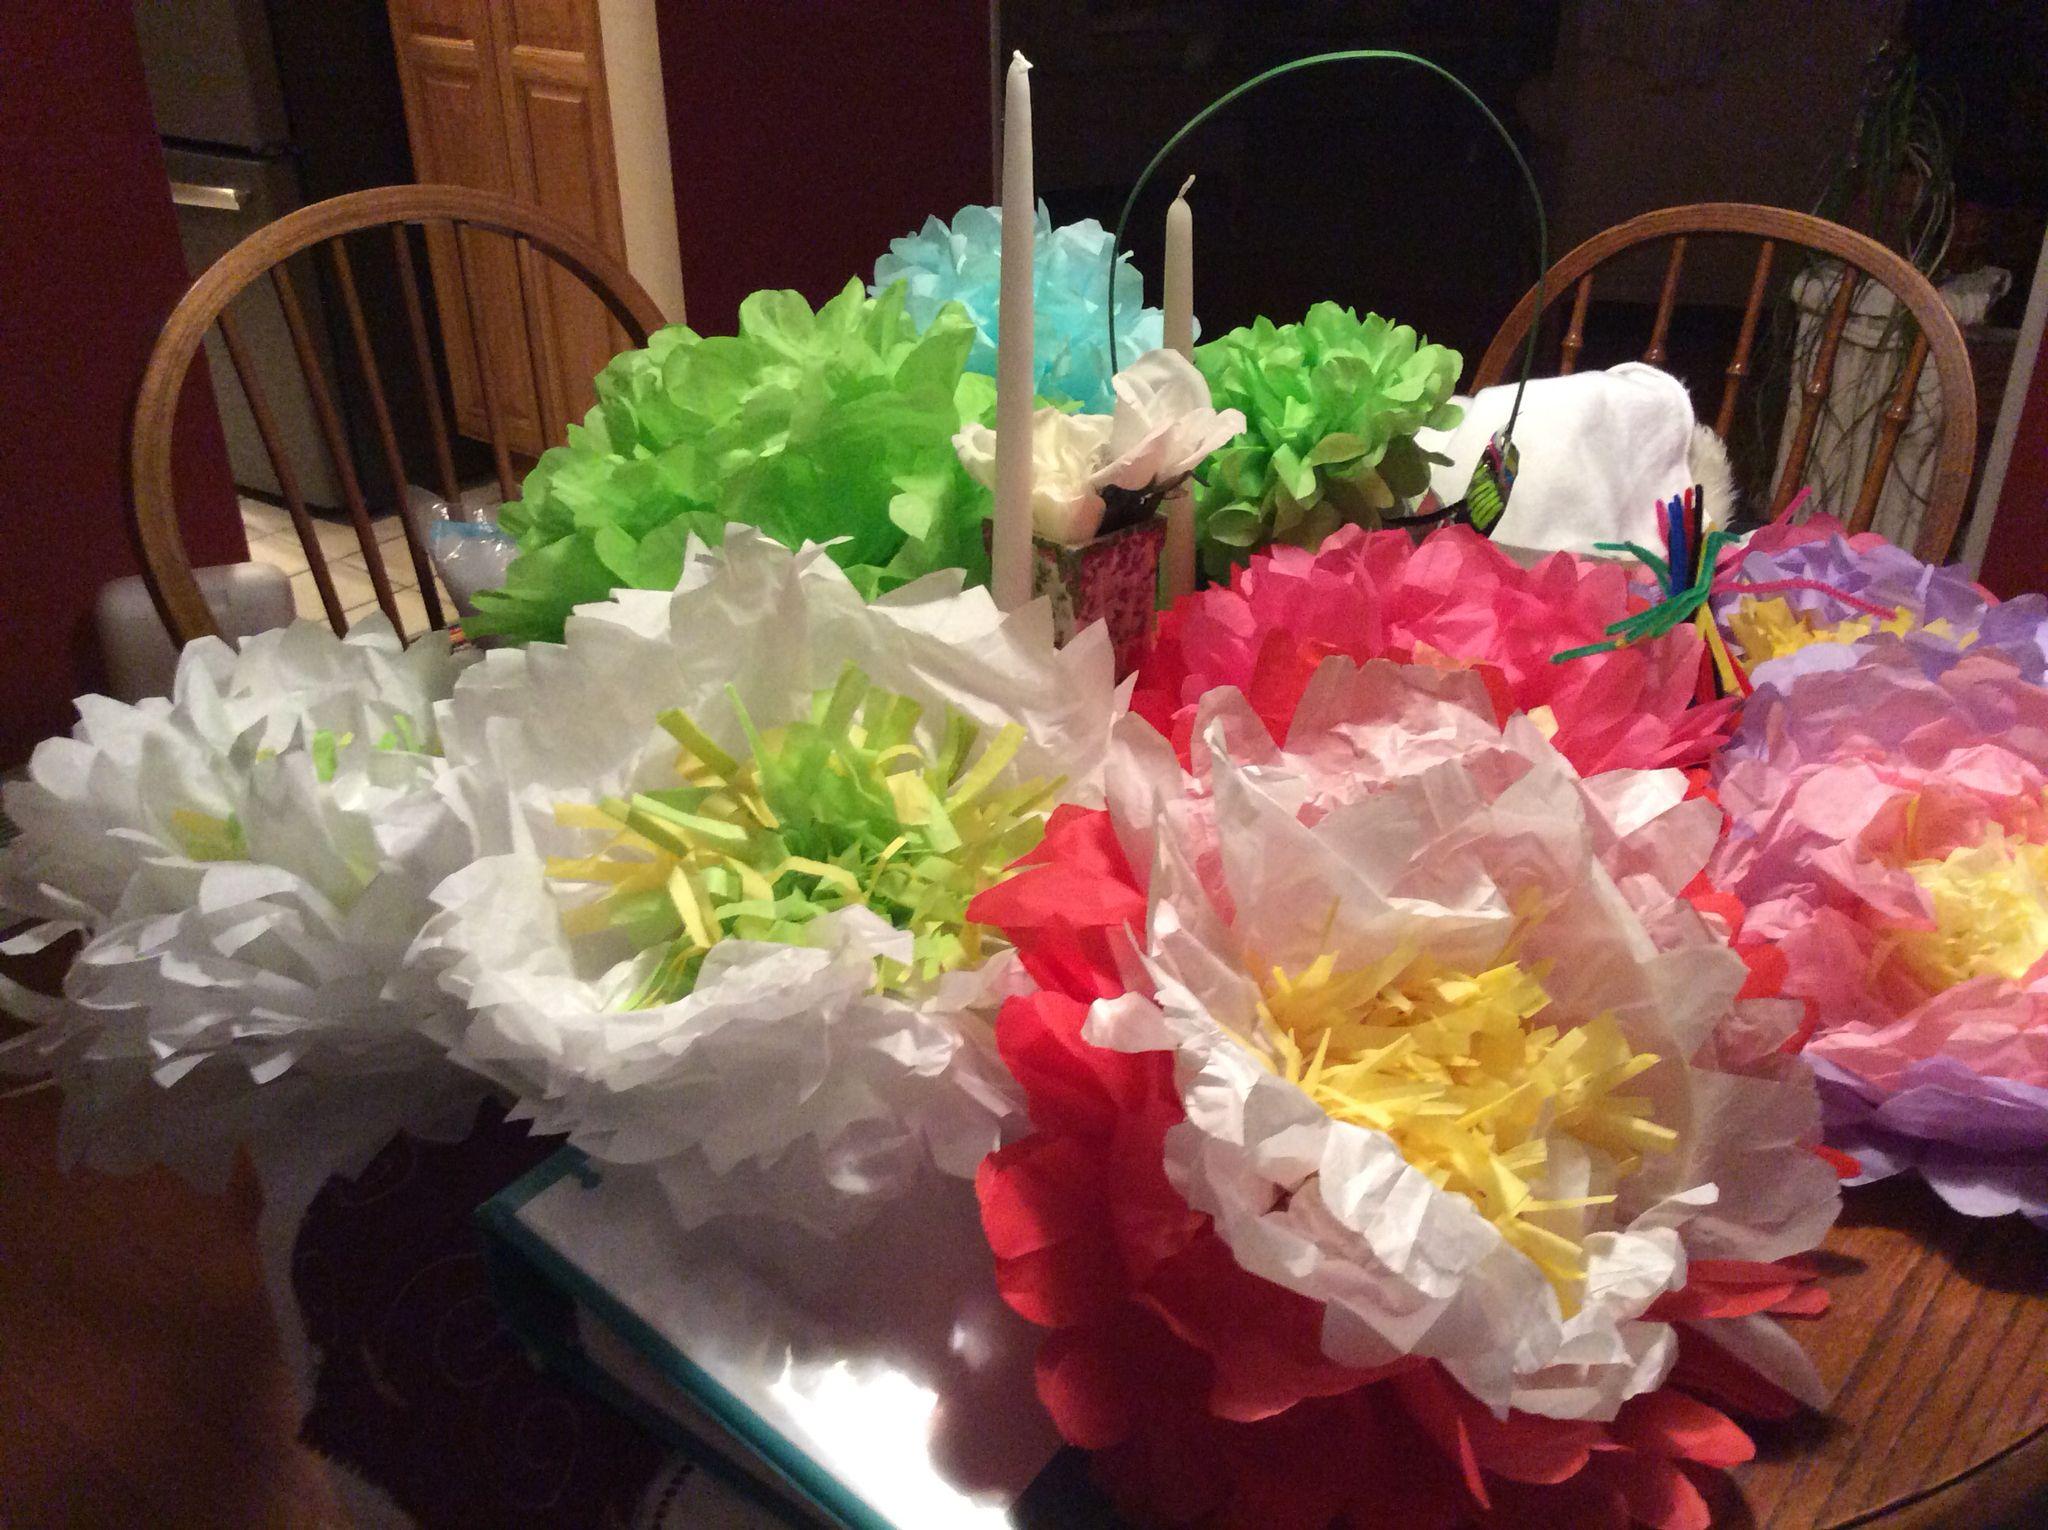 Spent this snowy spring break evening making tissue paper flowers